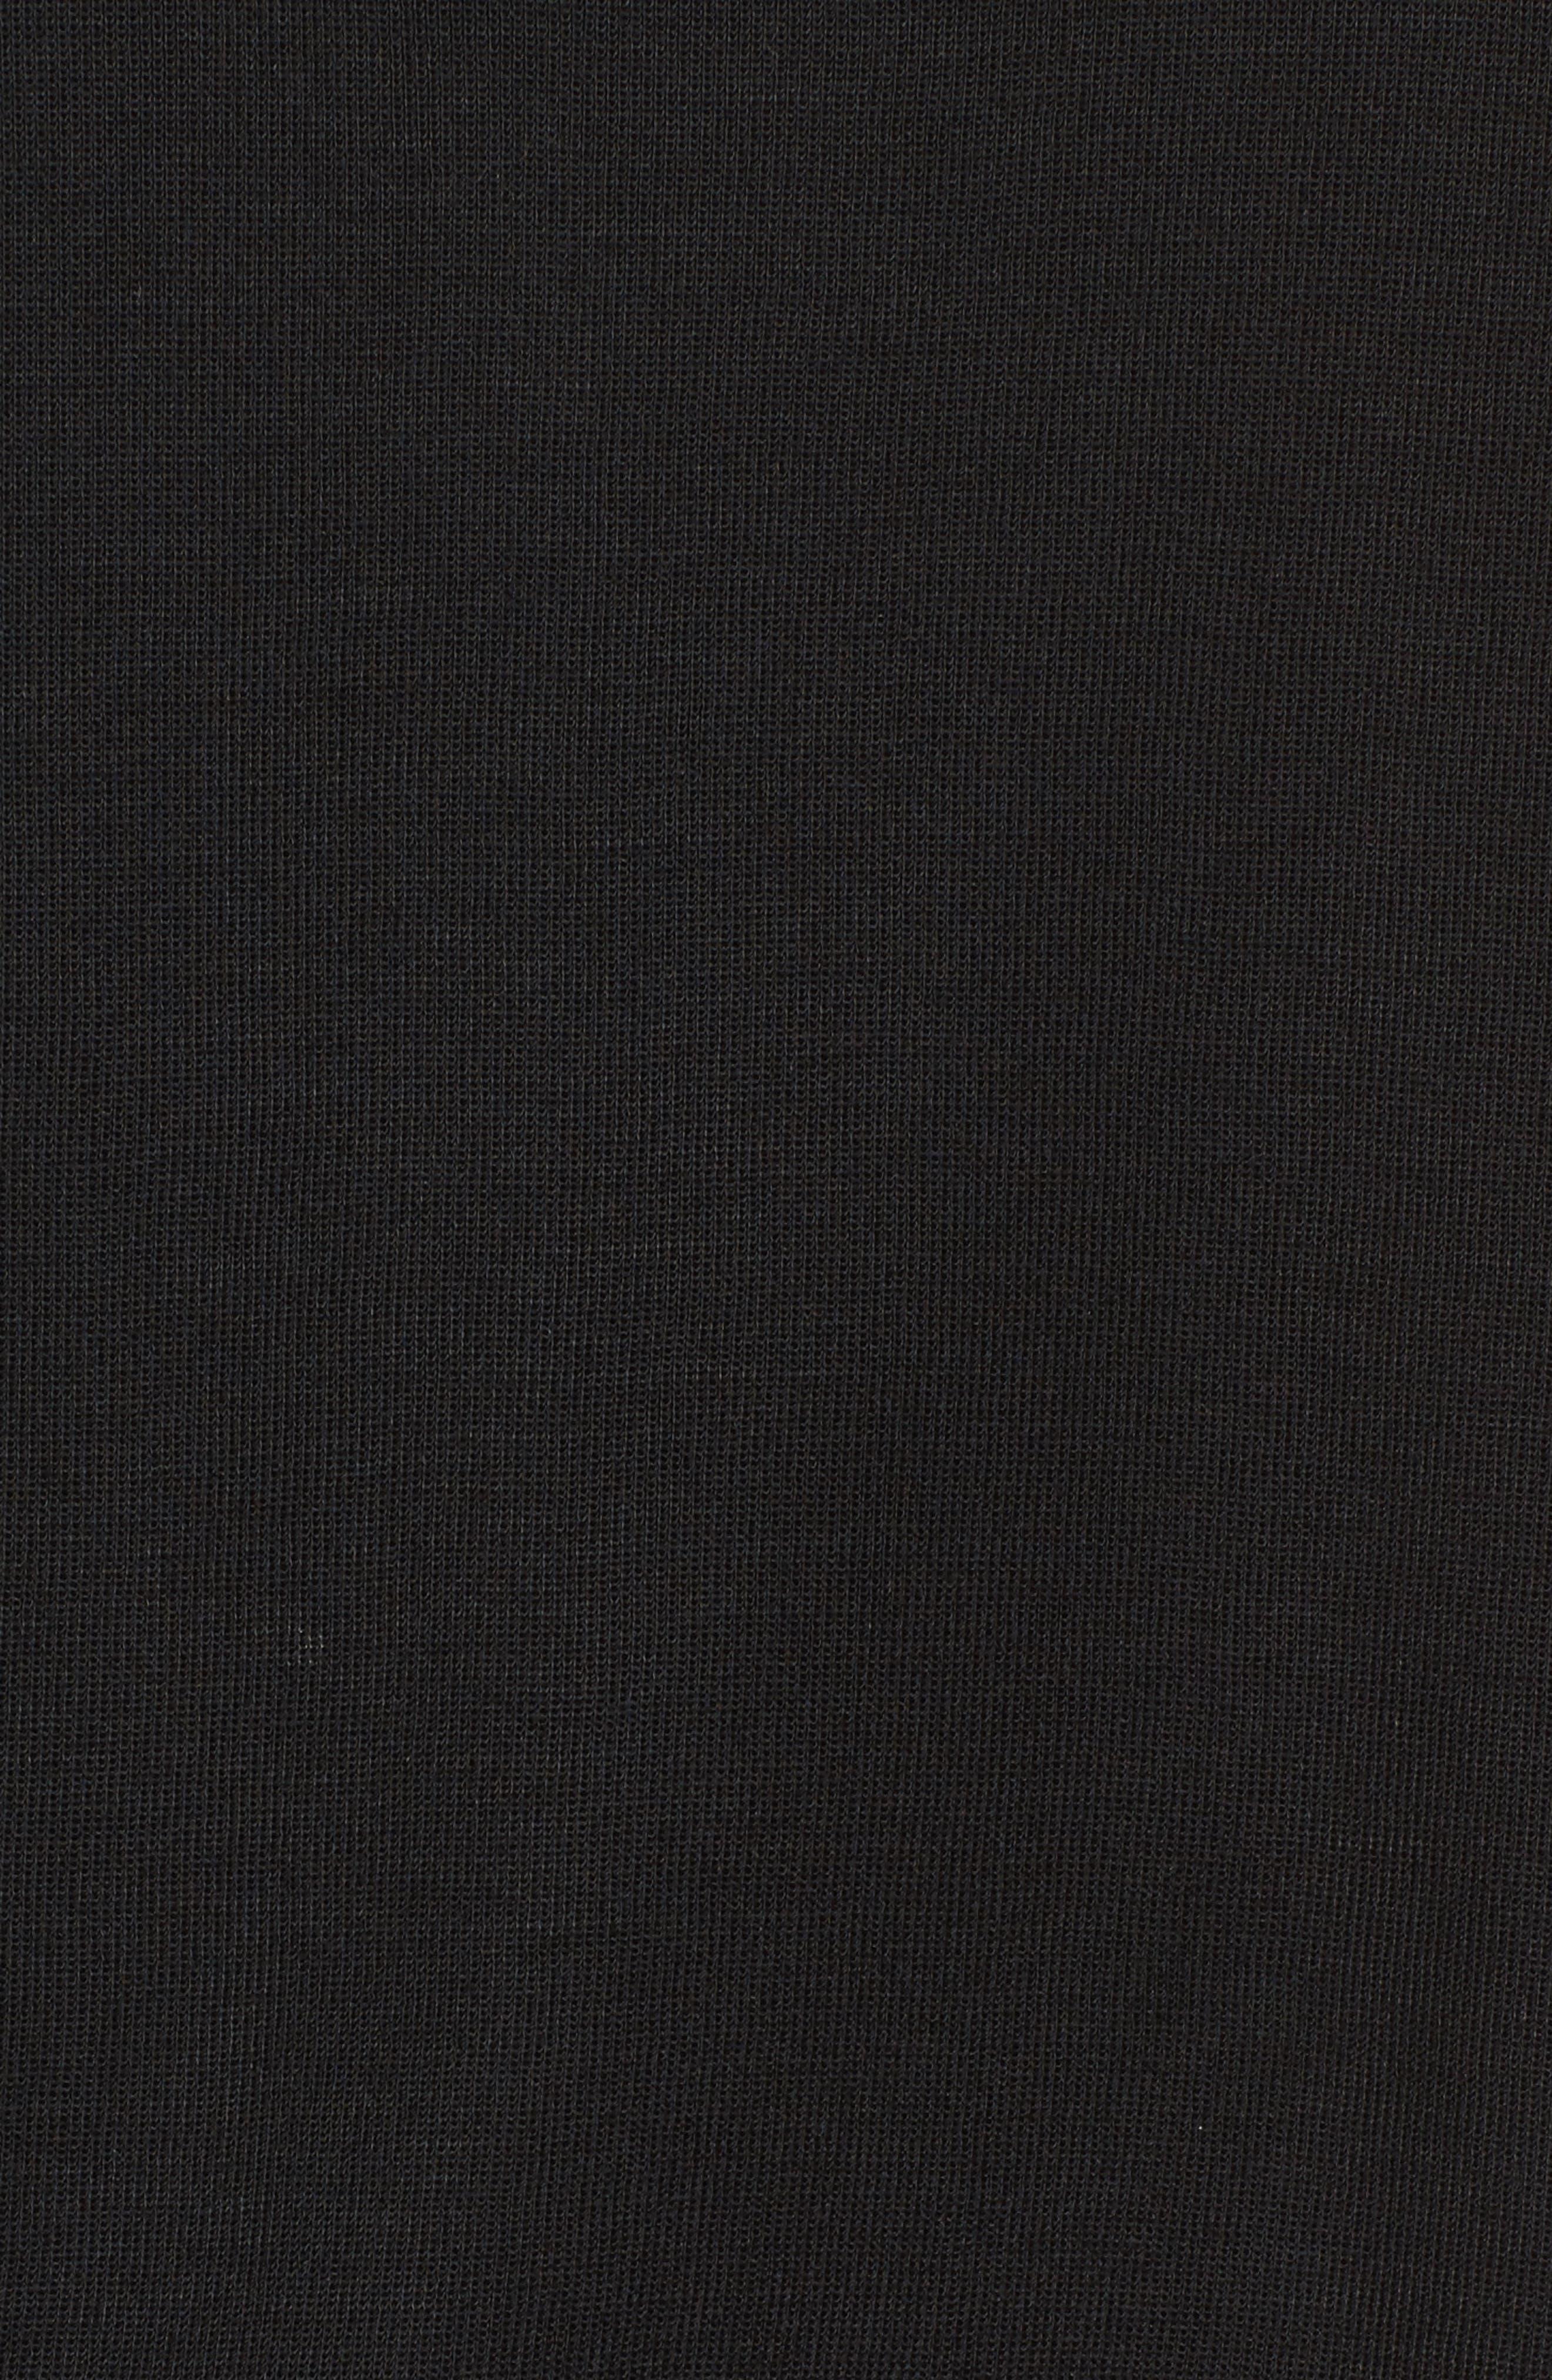 V-Neck Contrast Tank Top,                             Alternate thumbnail 5, color,                             BLACK/ WHITE